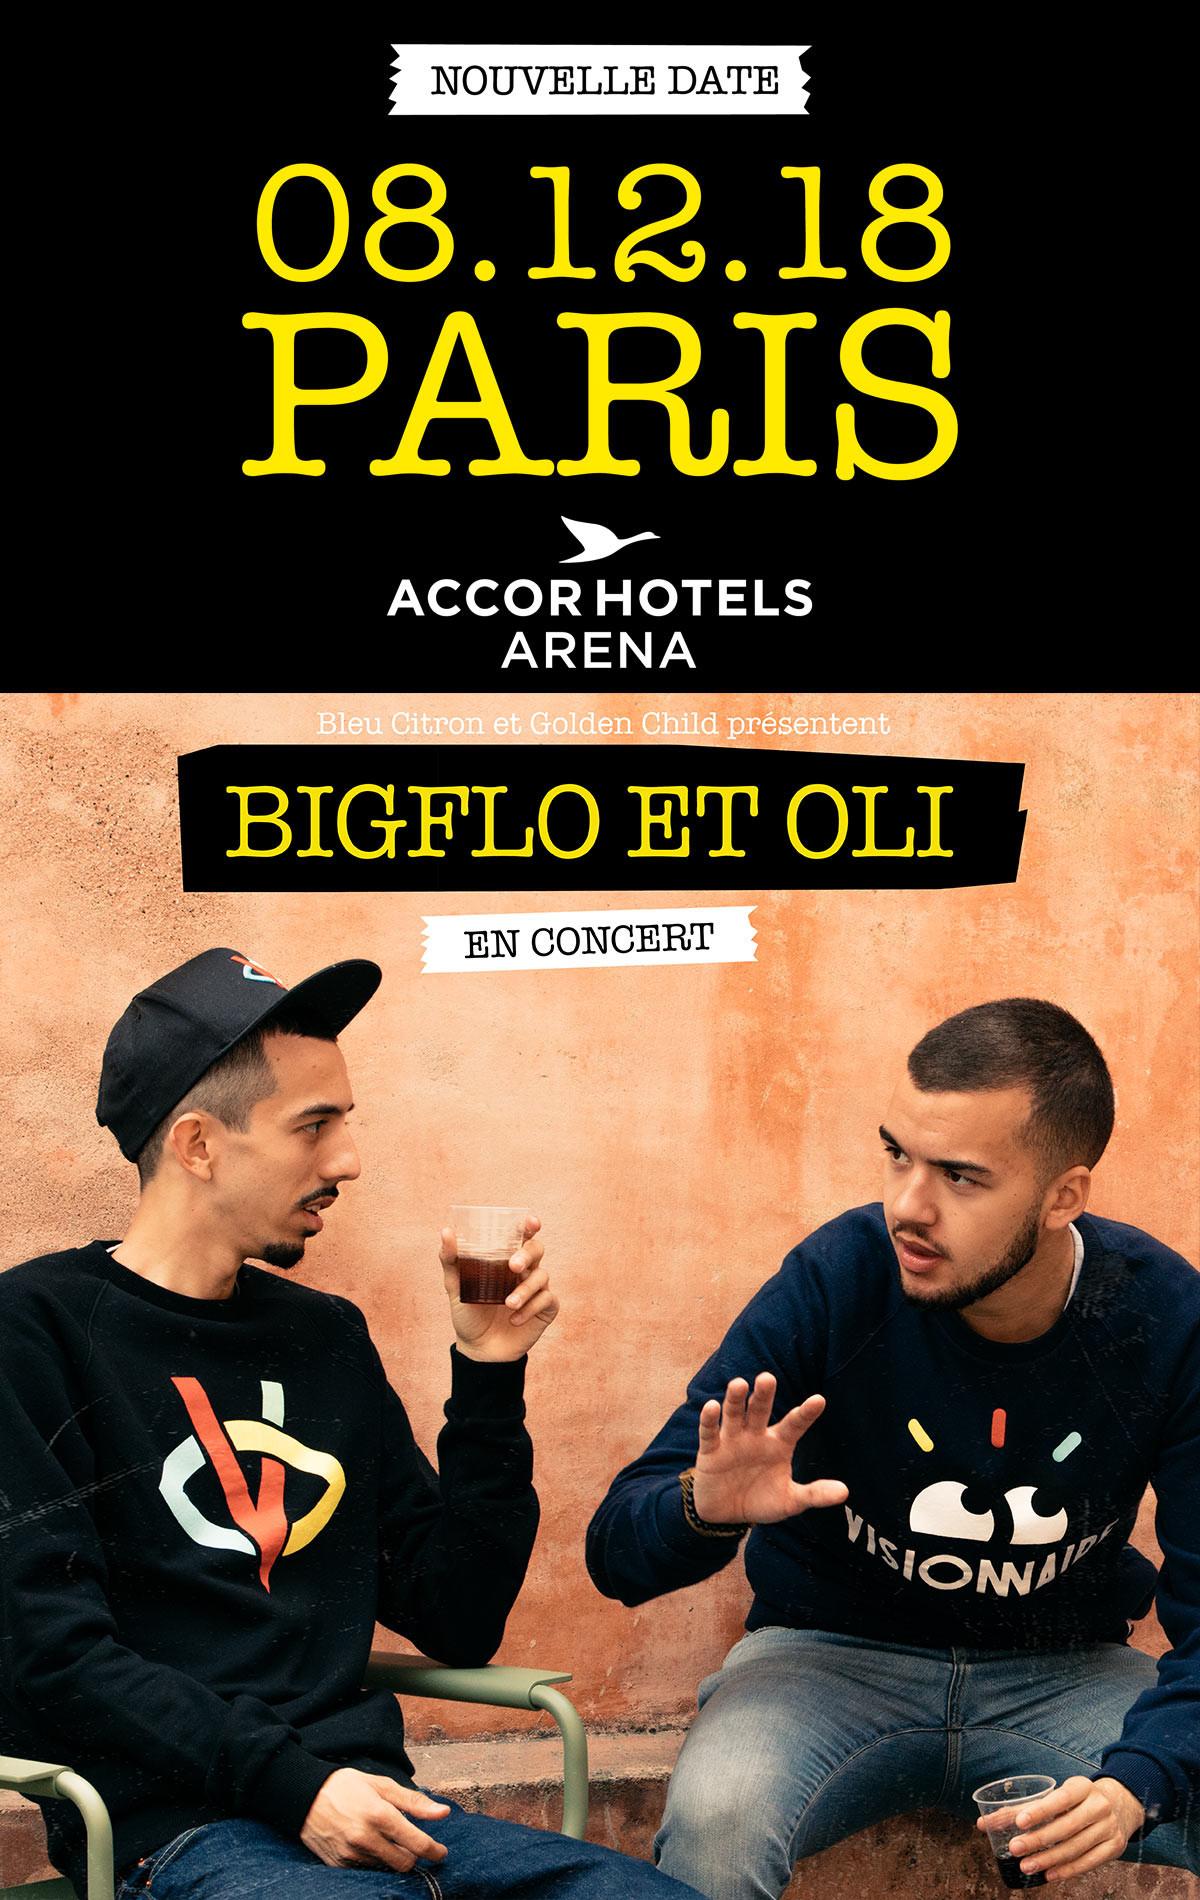 Big flow à Bercy pour Bigflo etOli